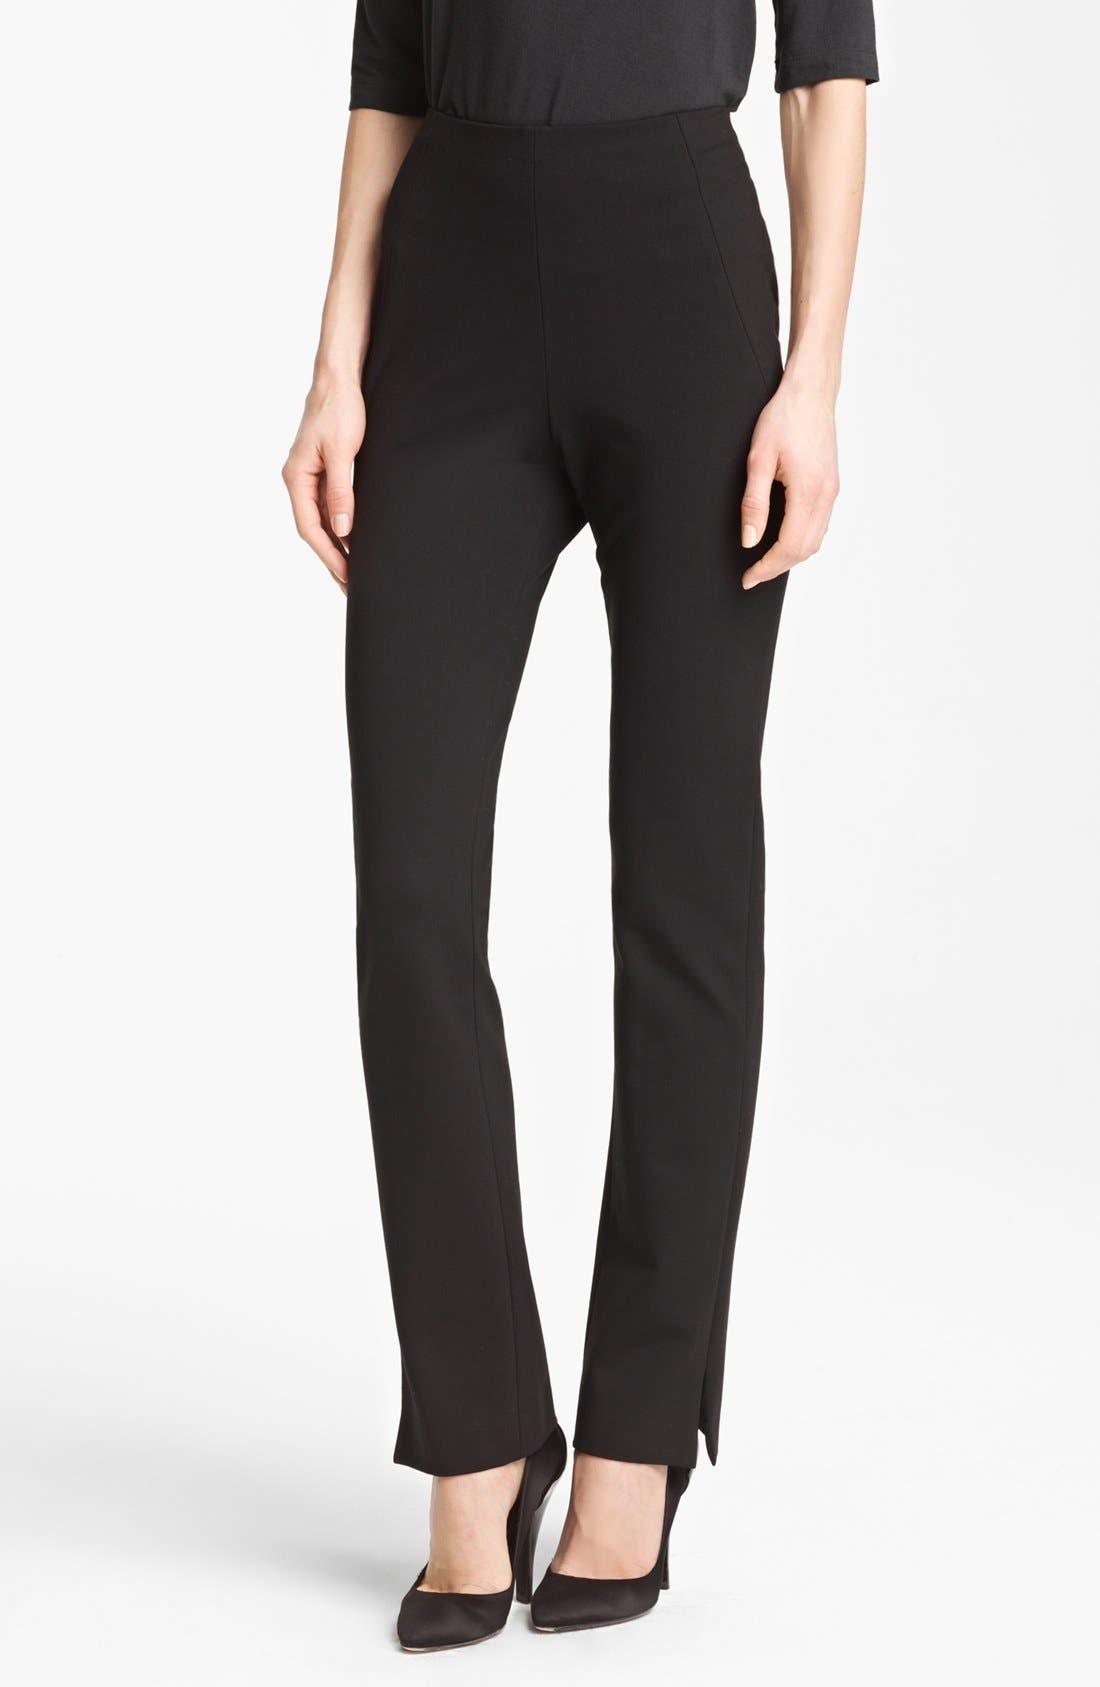 Alternate Image 1 Selected - Donna Karan New York Slim Jersey Pants